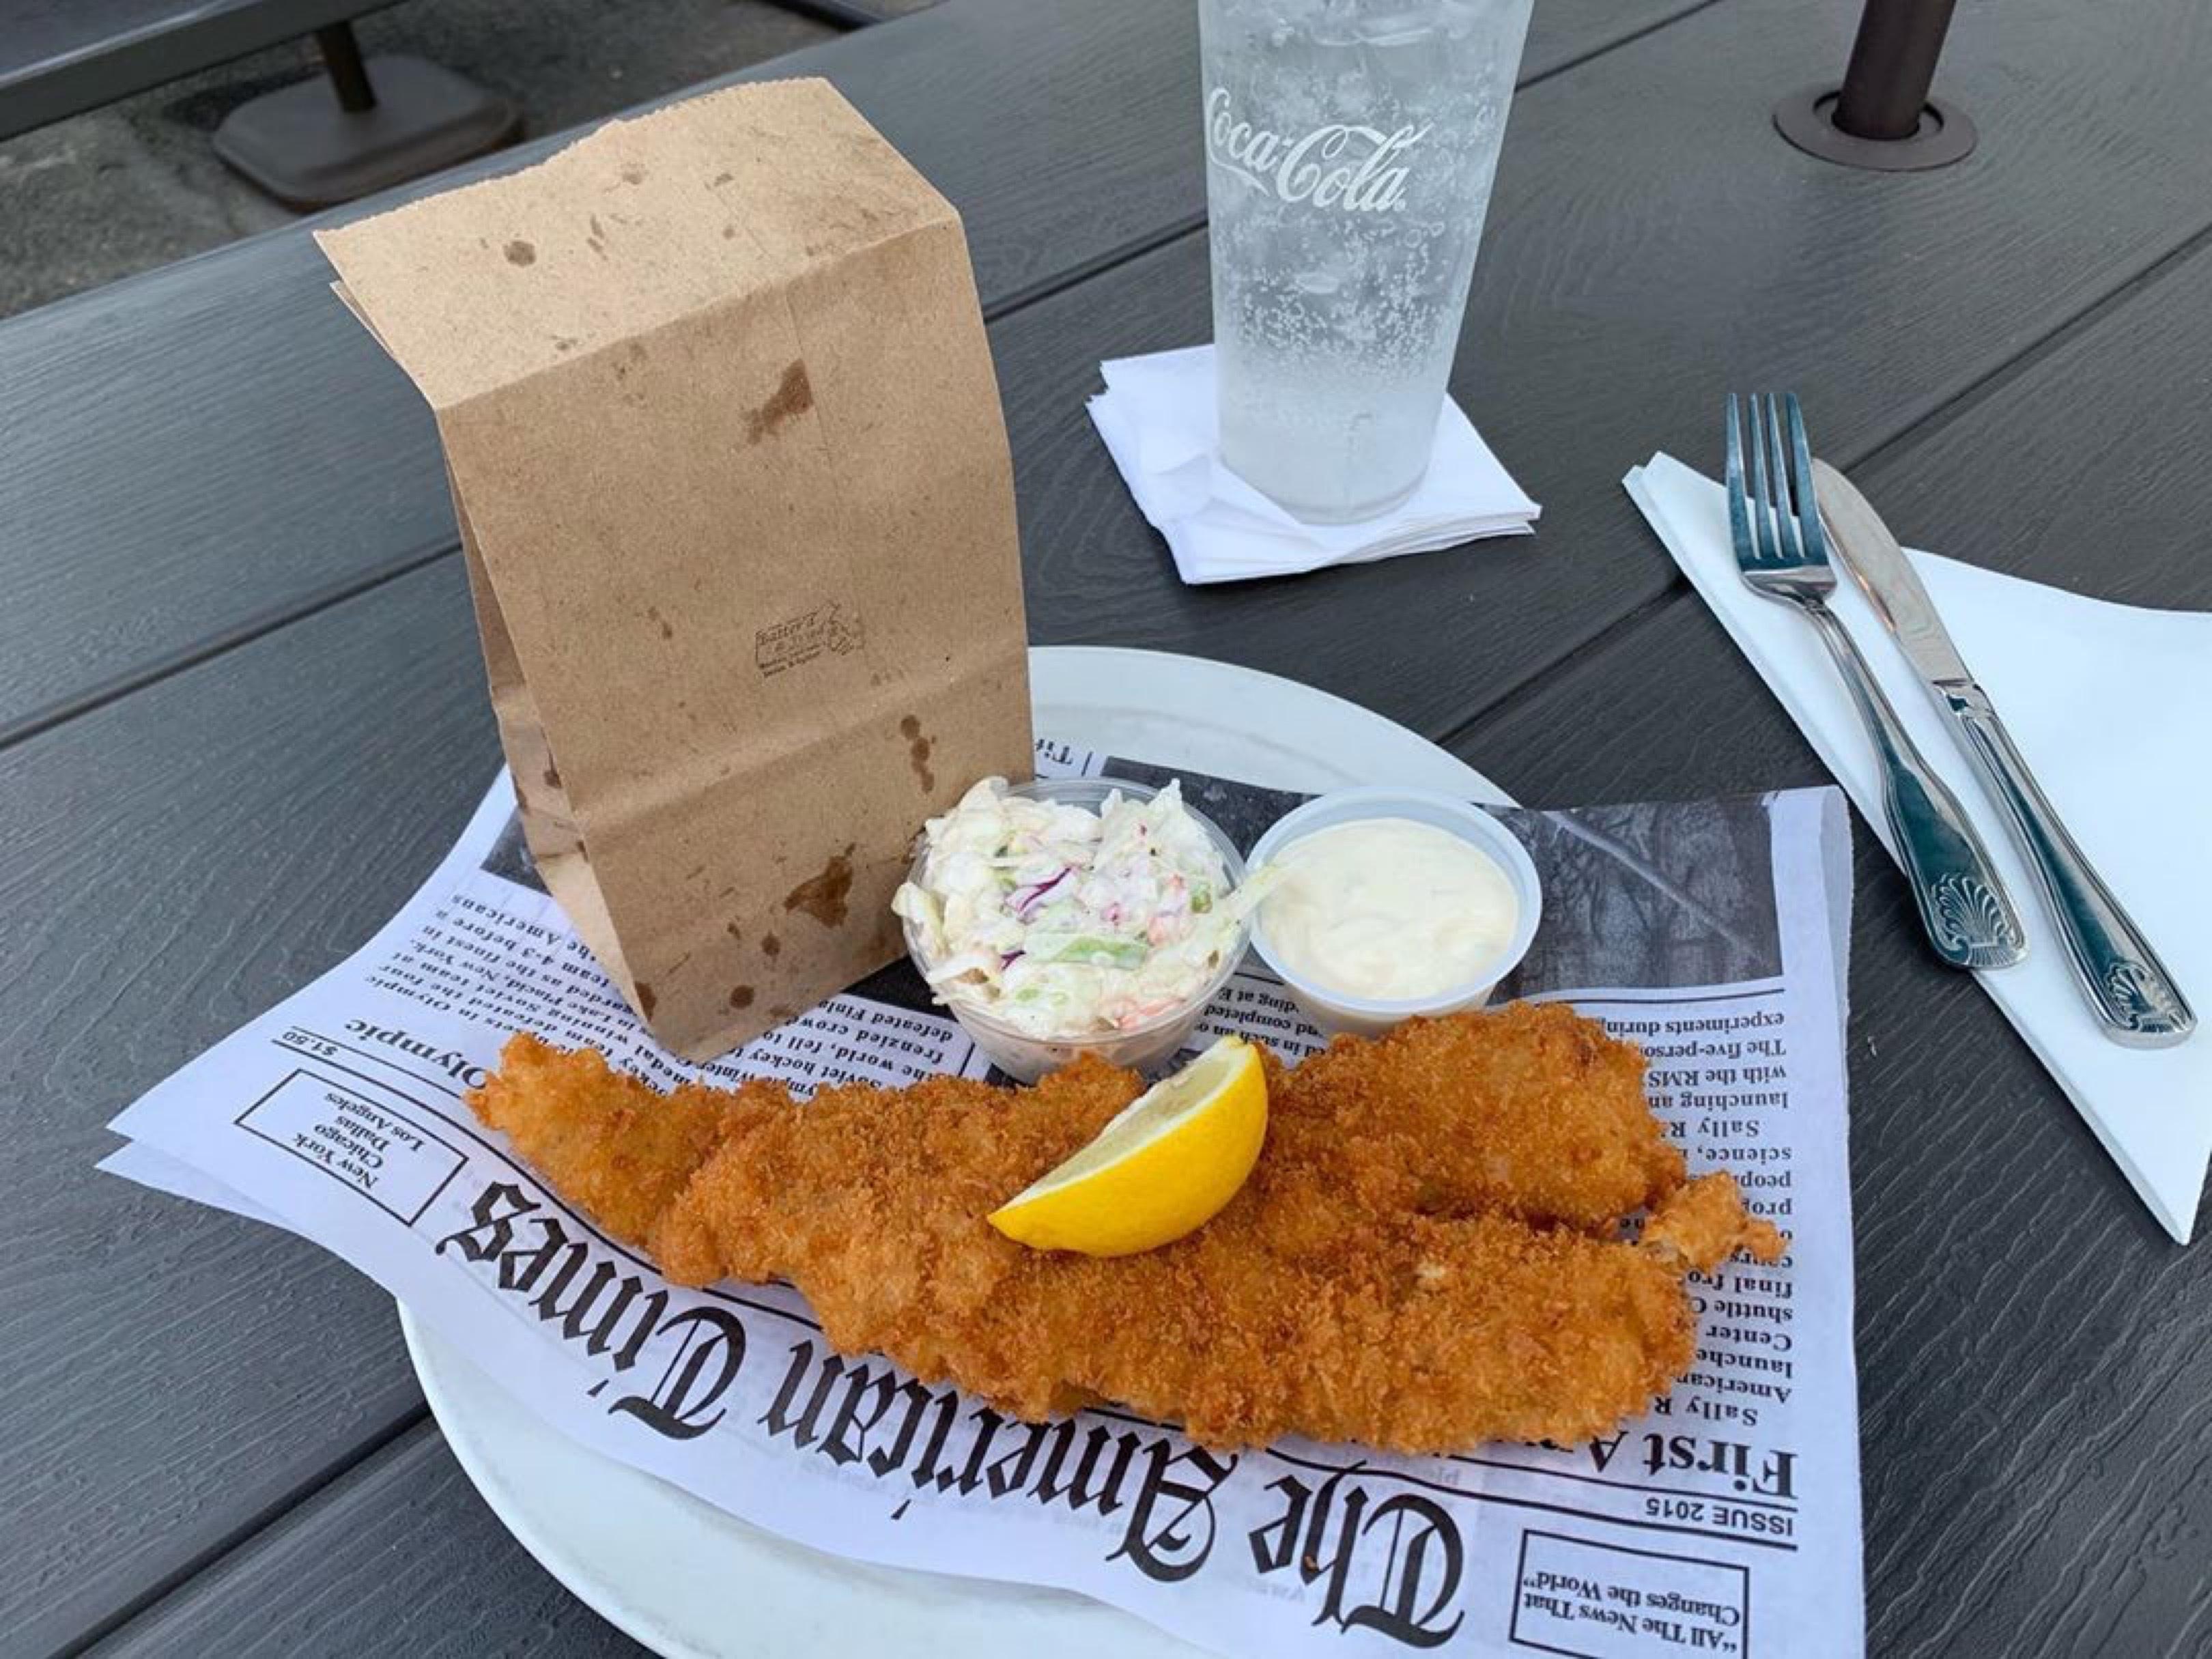 a platter of fried fish, slaw served on newspaper